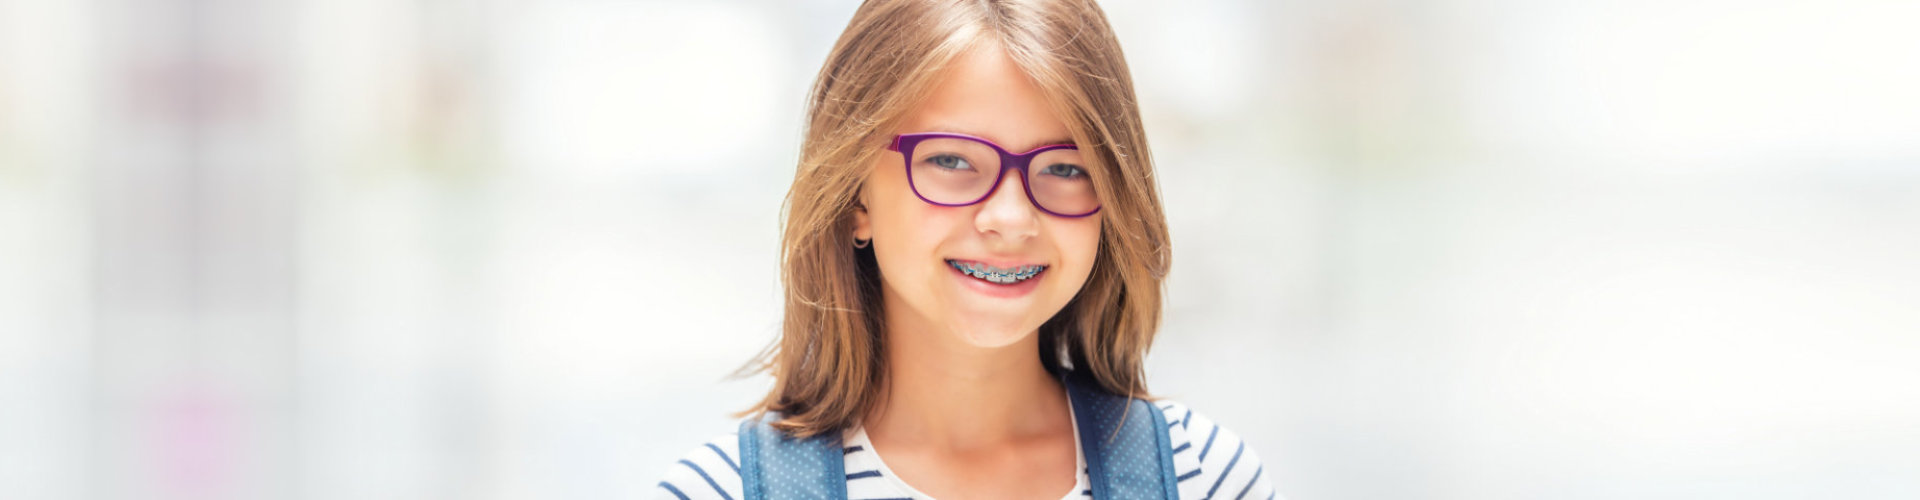 female kid smiling